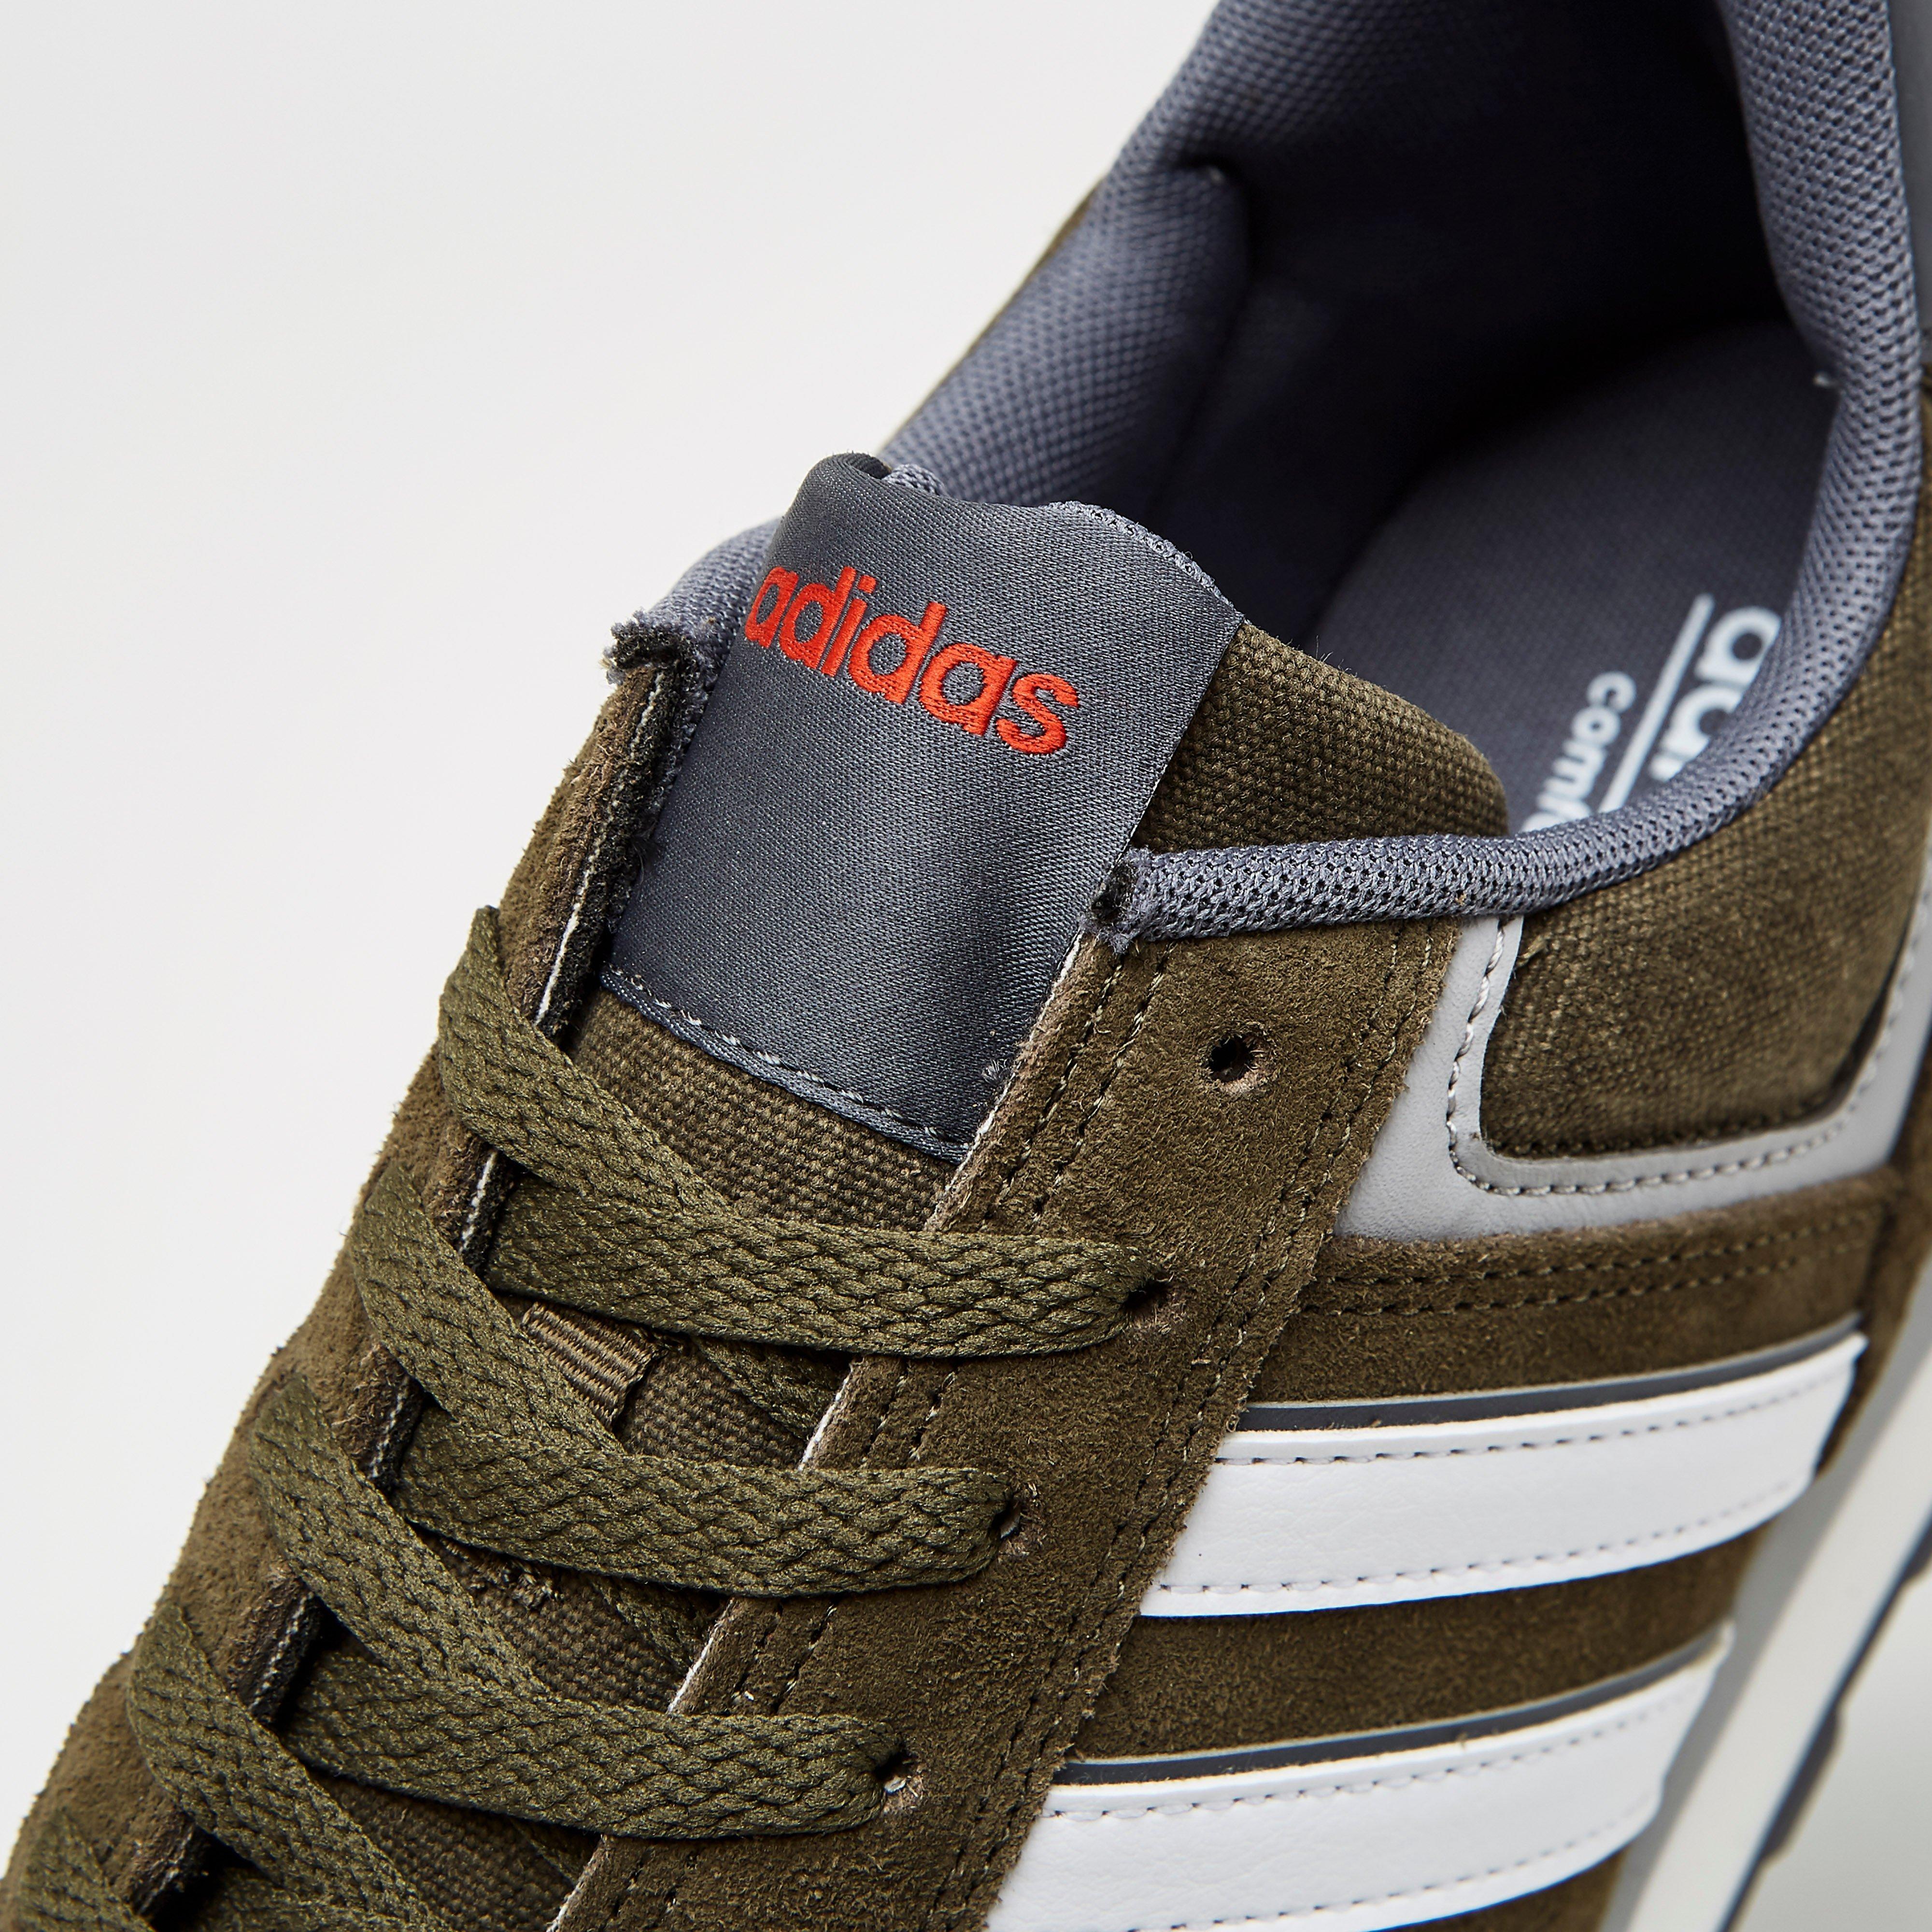 10k Adidas Chaussures Pour Hommes Bulxm